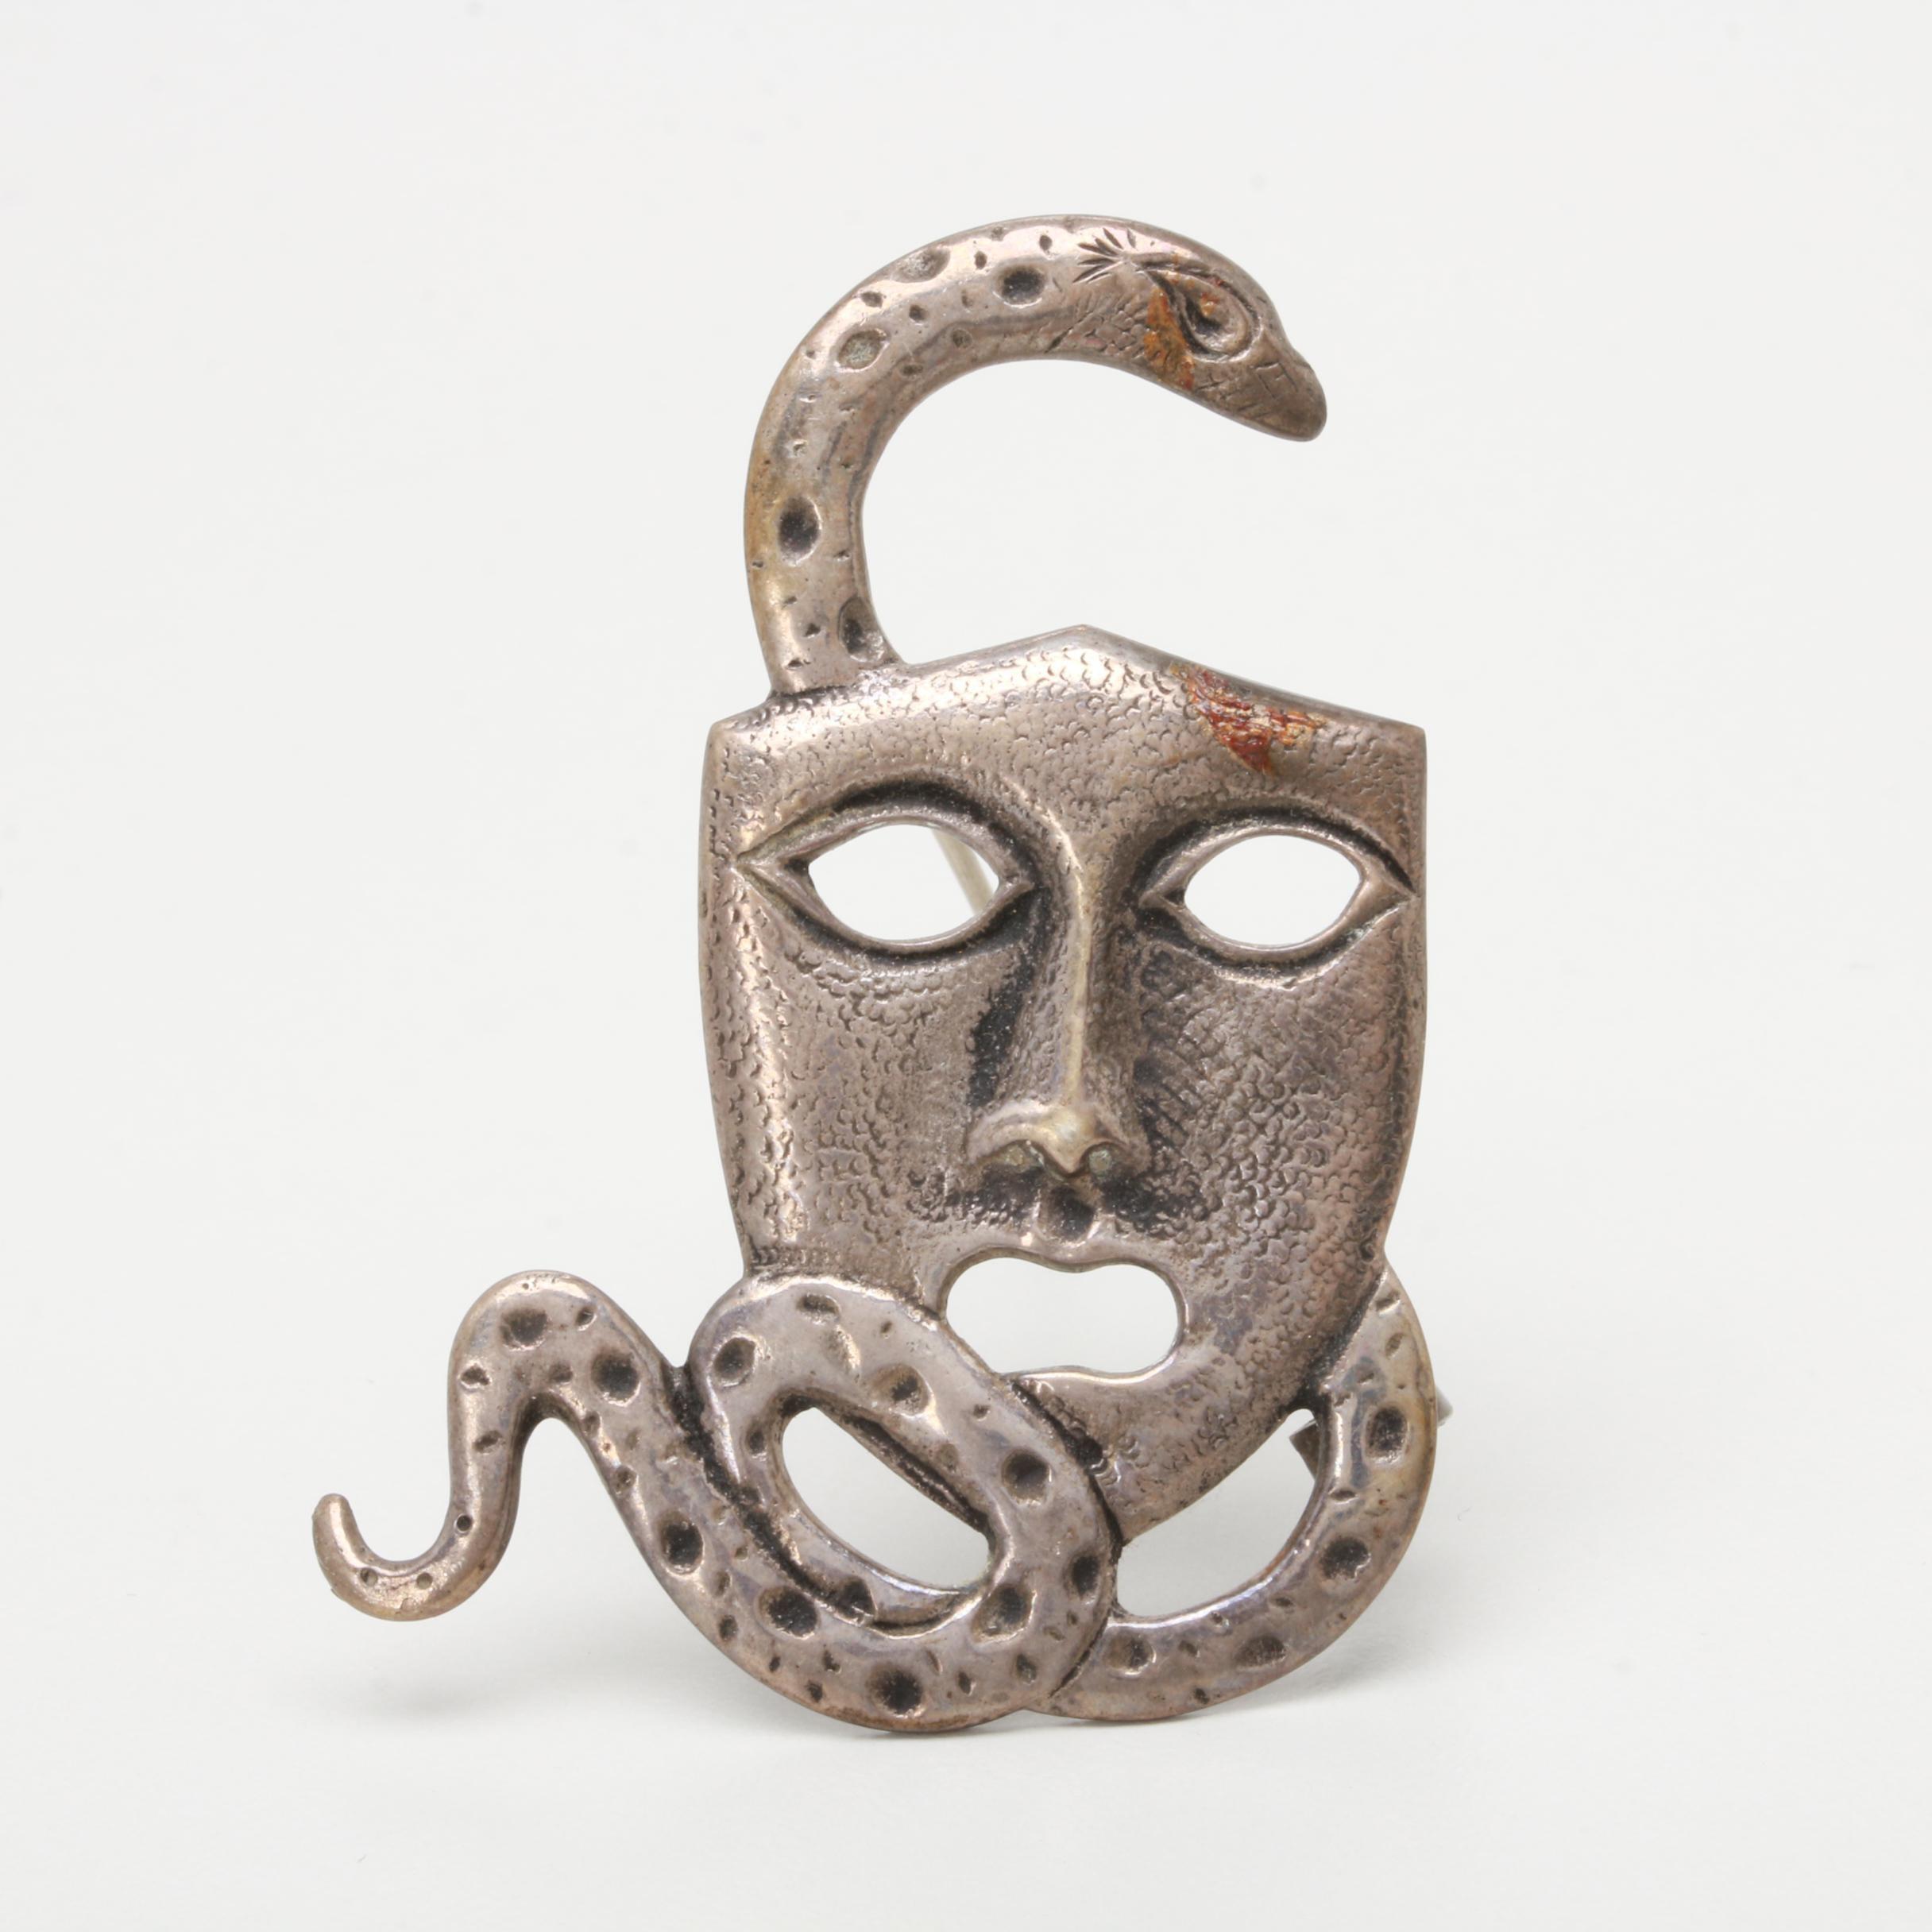 900 Silver Mask Motif Brooch